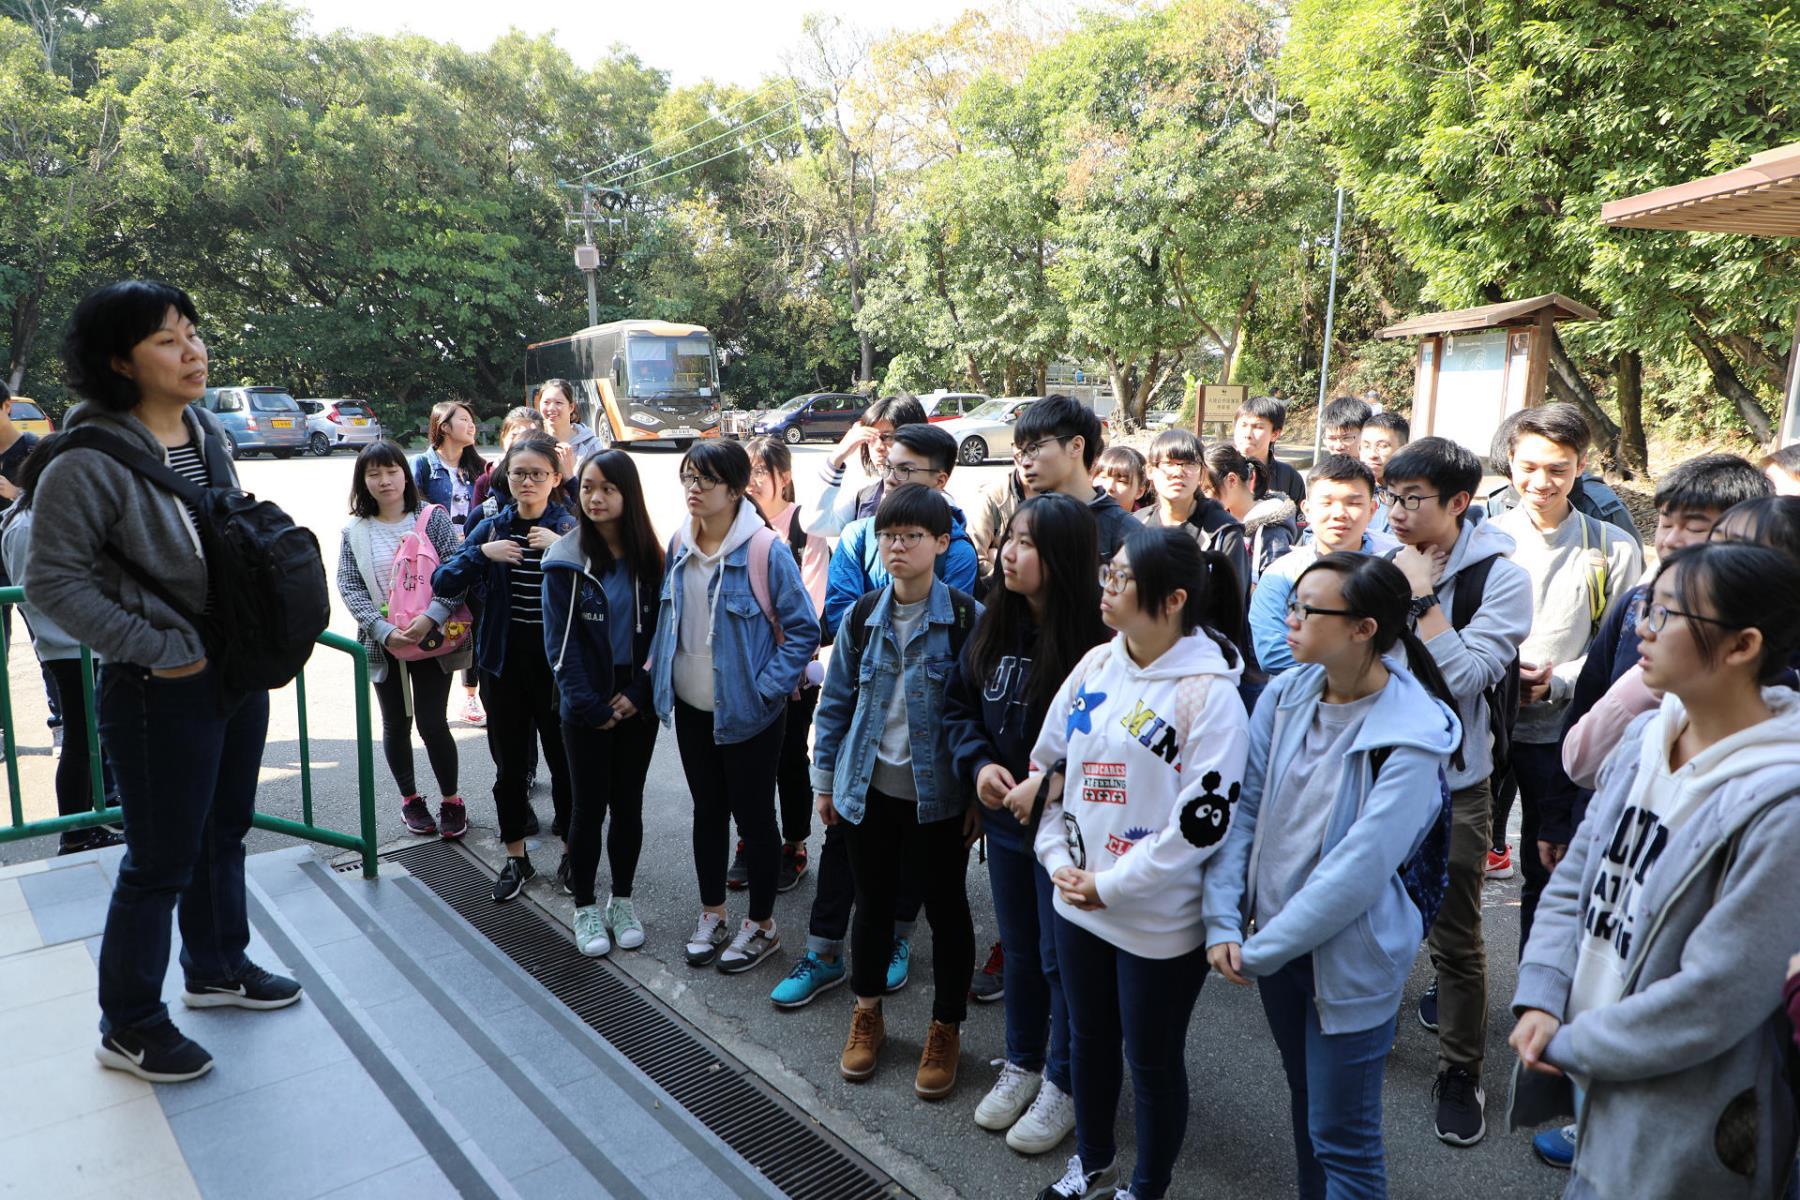 http://www.npc.edu.hk/sites/default/files/01_8.jpg